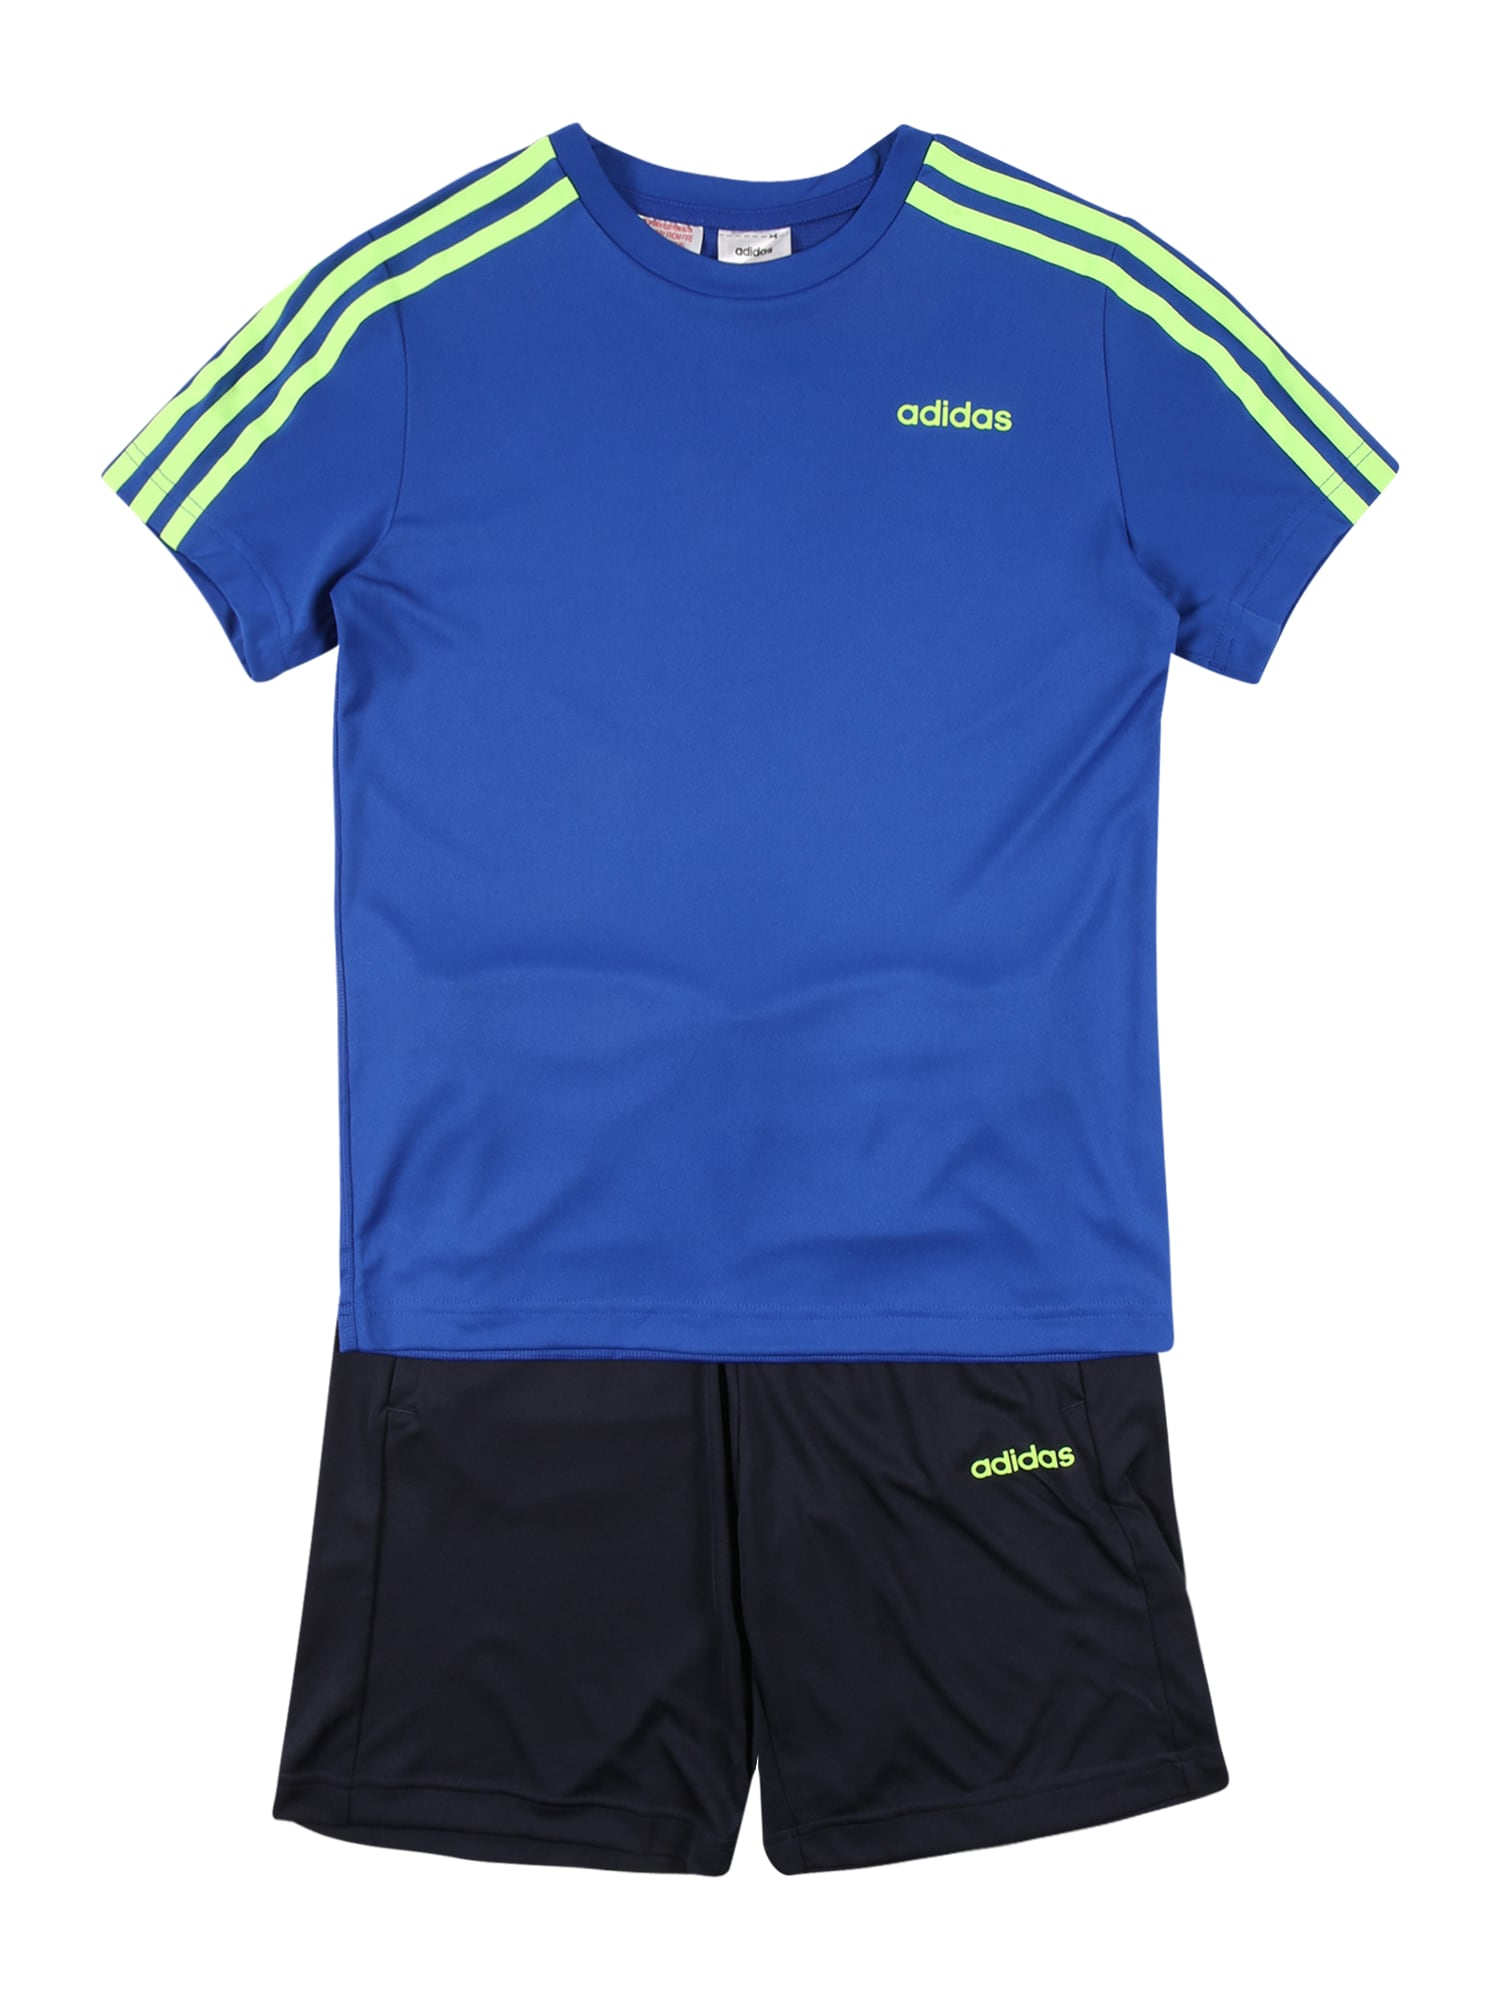 ADIDAS PERFORMANCE Sportinis kostiumas mėlyna / nakties mėlyna / balta